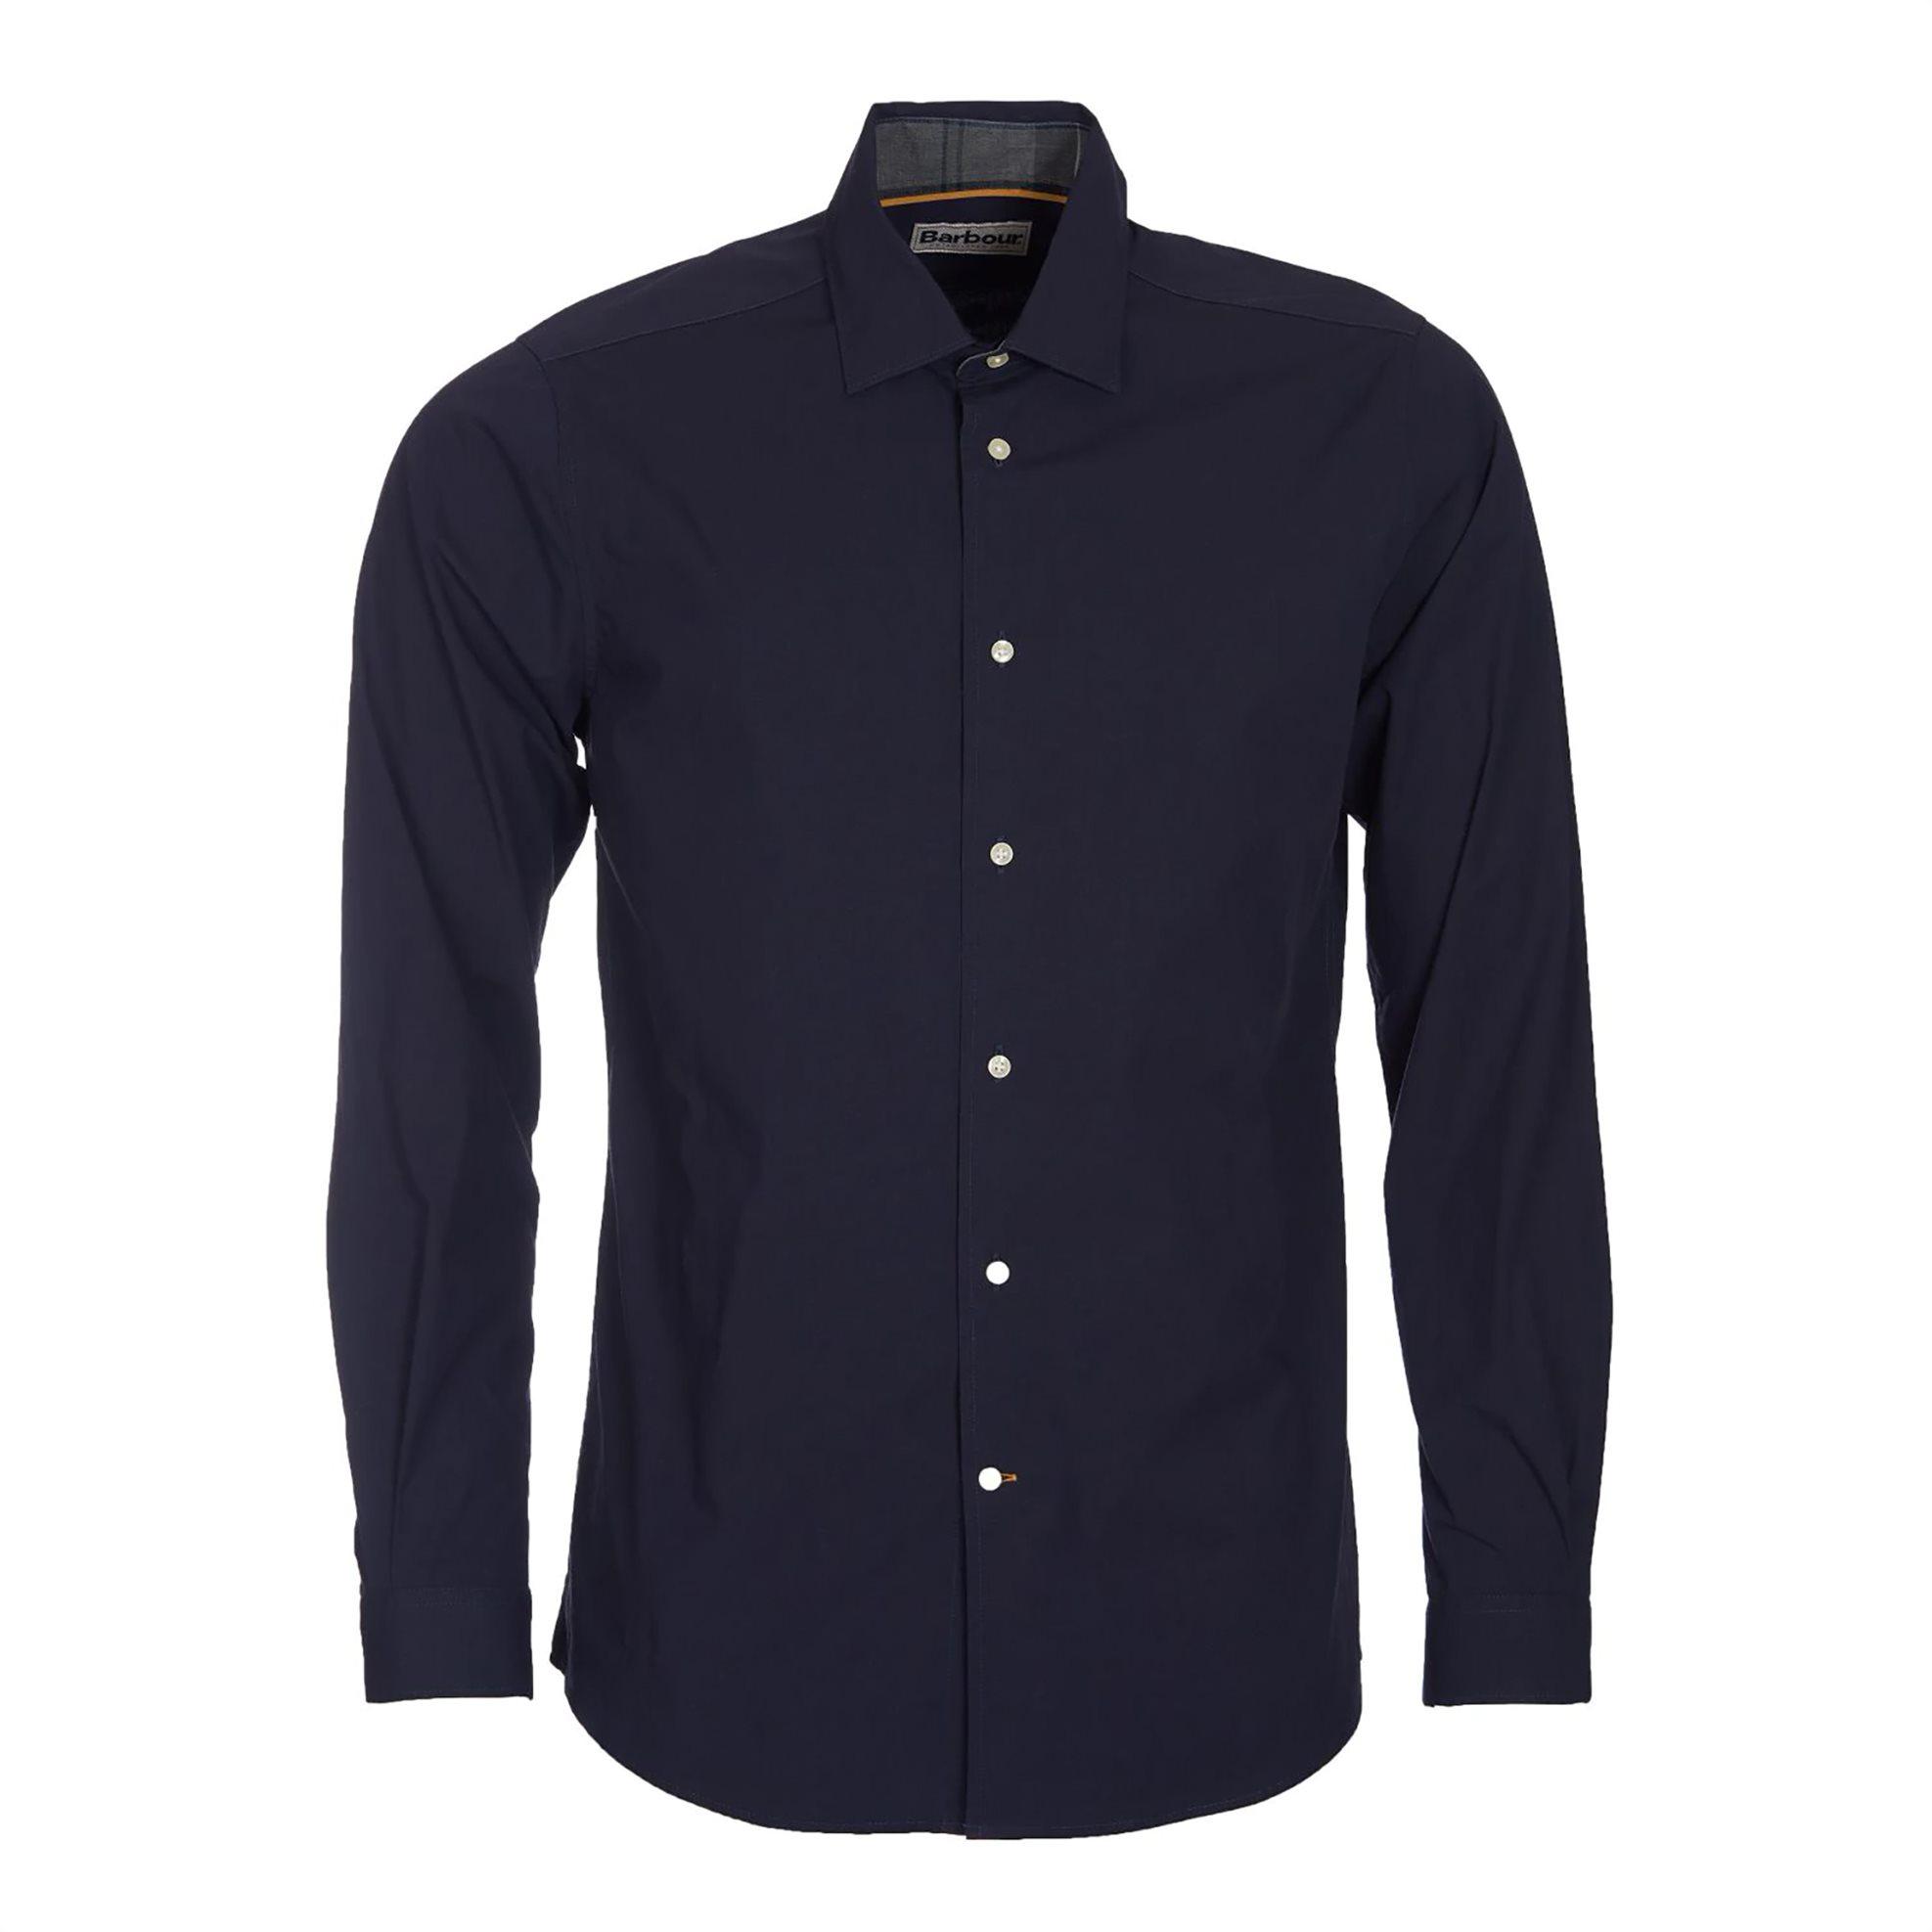 Barbour ανδρικό πουκάμισο ποπλίνα μονόχρωμο - MSH4363 - Μπλε Σκούρο ανδρασ   ρουχα   πουκάμισα   επίσημα   βραδυνά